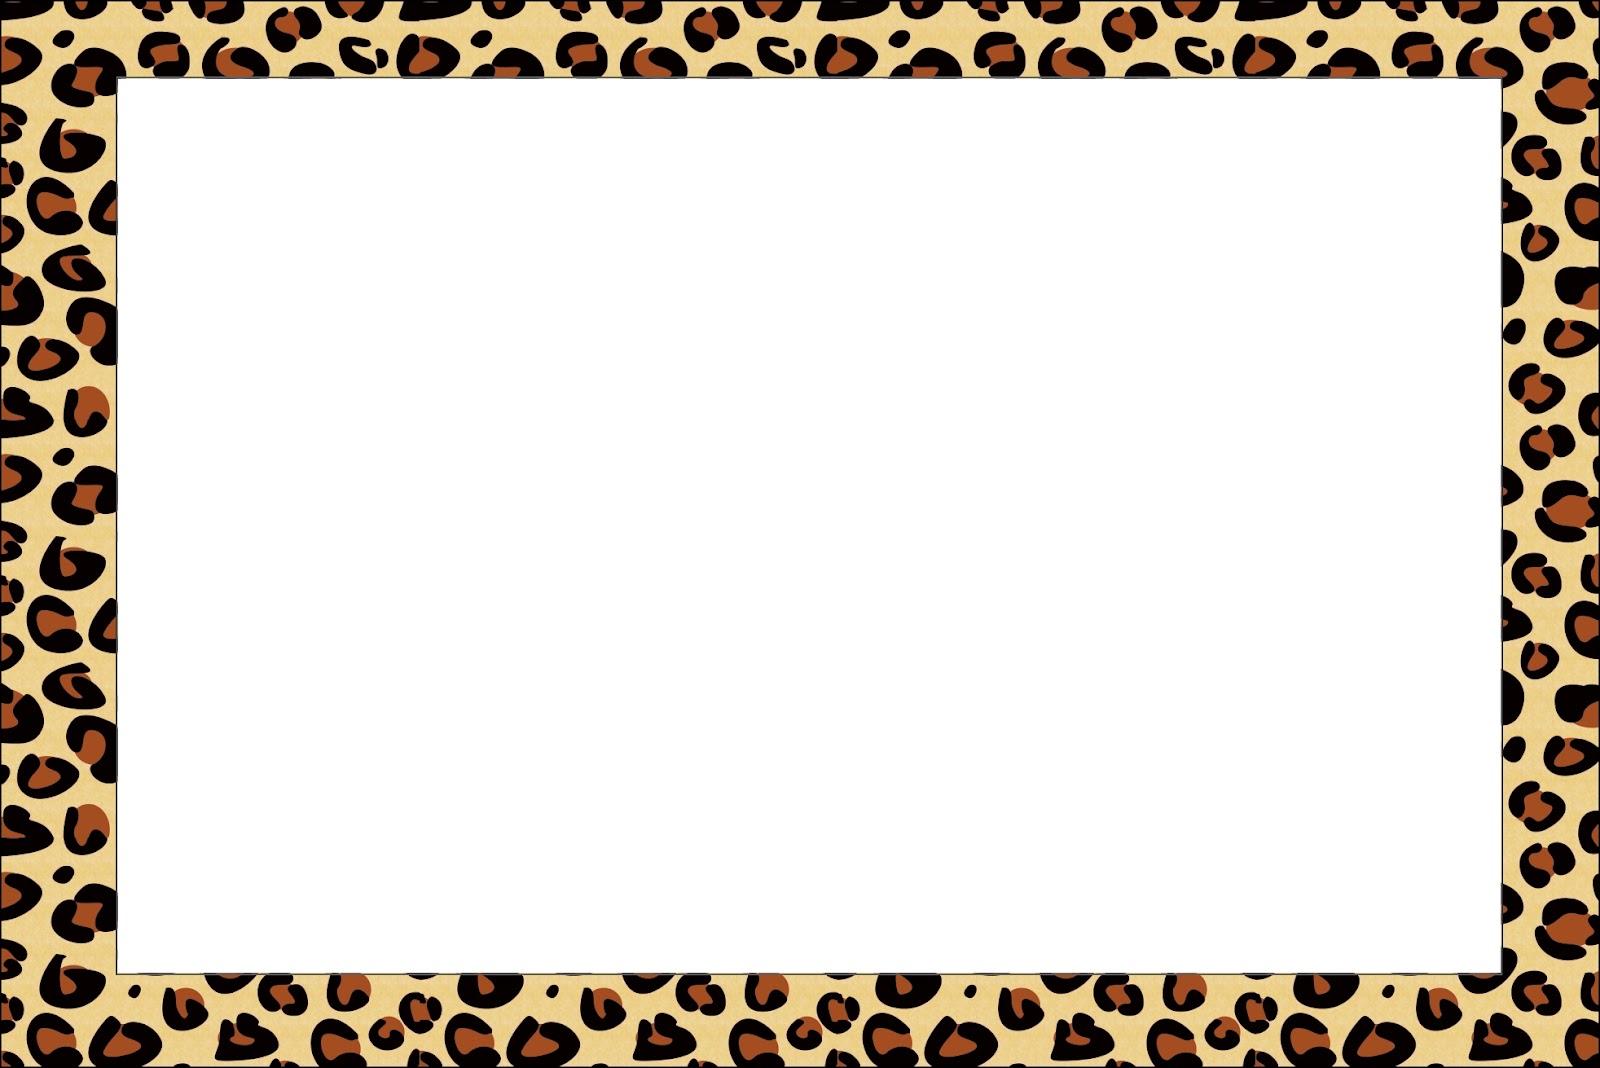 Cheetah Print Invitation for beautiful invitation template